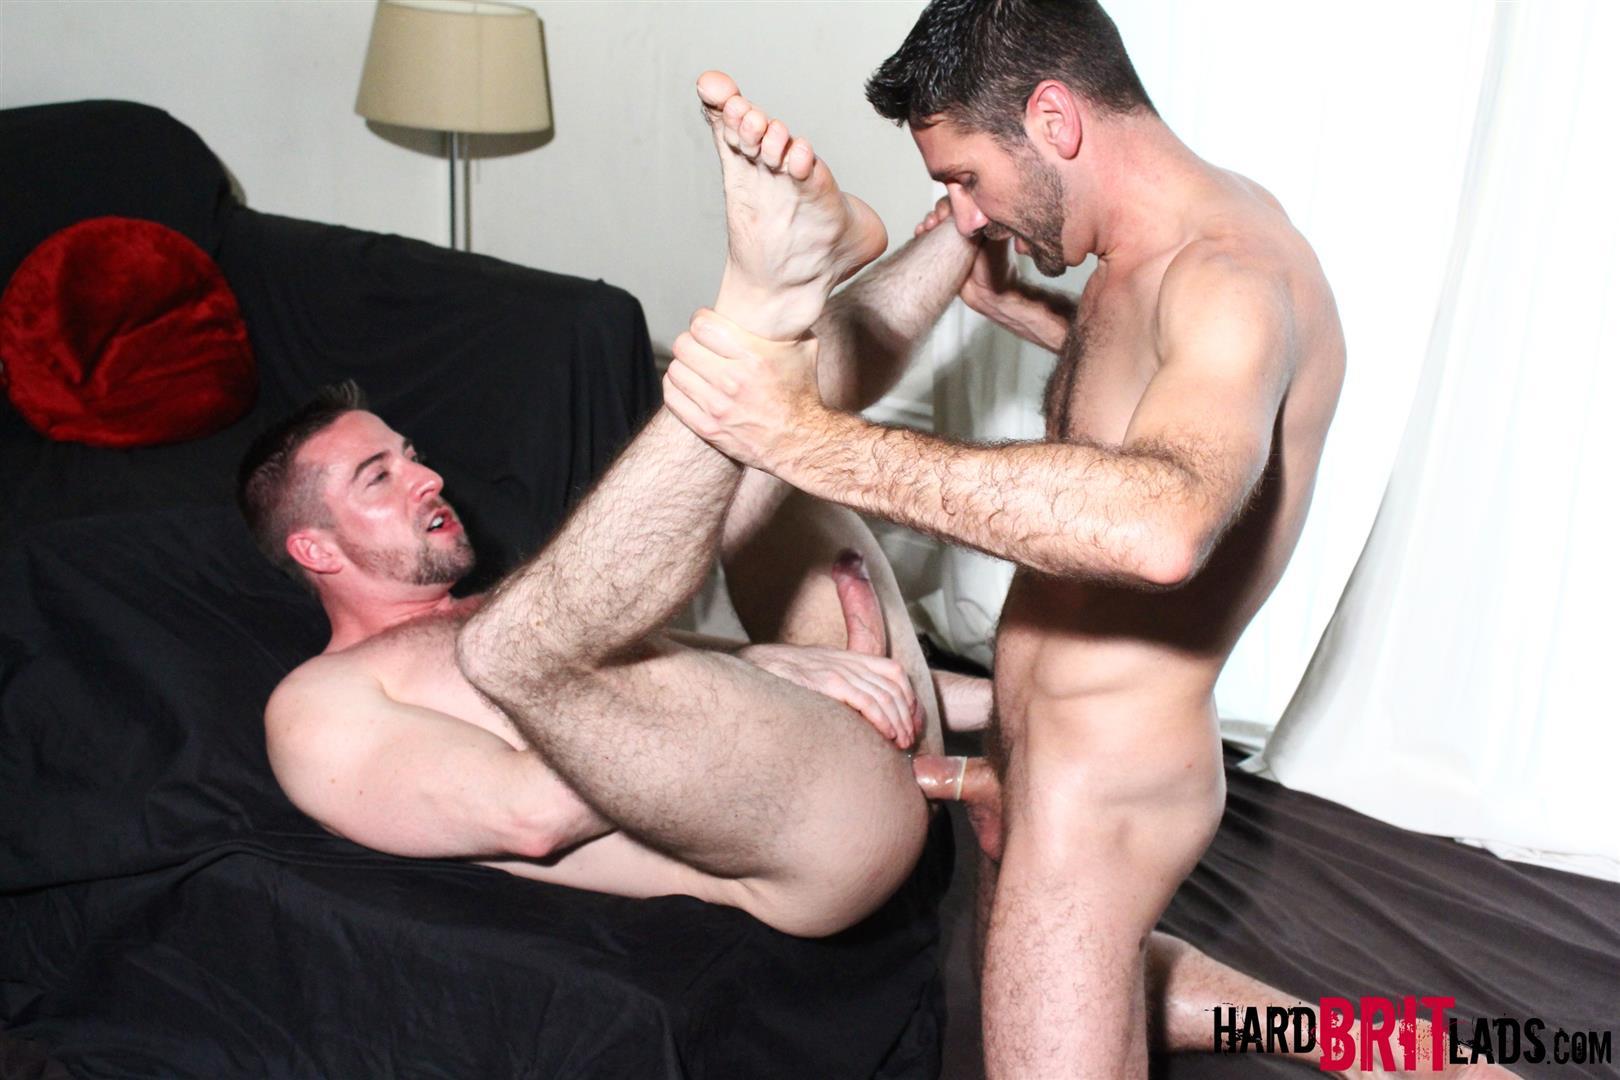 Hard-Brit-Lads-Craig-Daniel-Scott-Hunter-Hairy-Muscle-Hunks-With-Big-Uncut-Cocks-Fucking-Amateur-Gay-Porn-16 Hairy Muscle Hunks Fucking And Eating Cum From Big Uncut Cocks